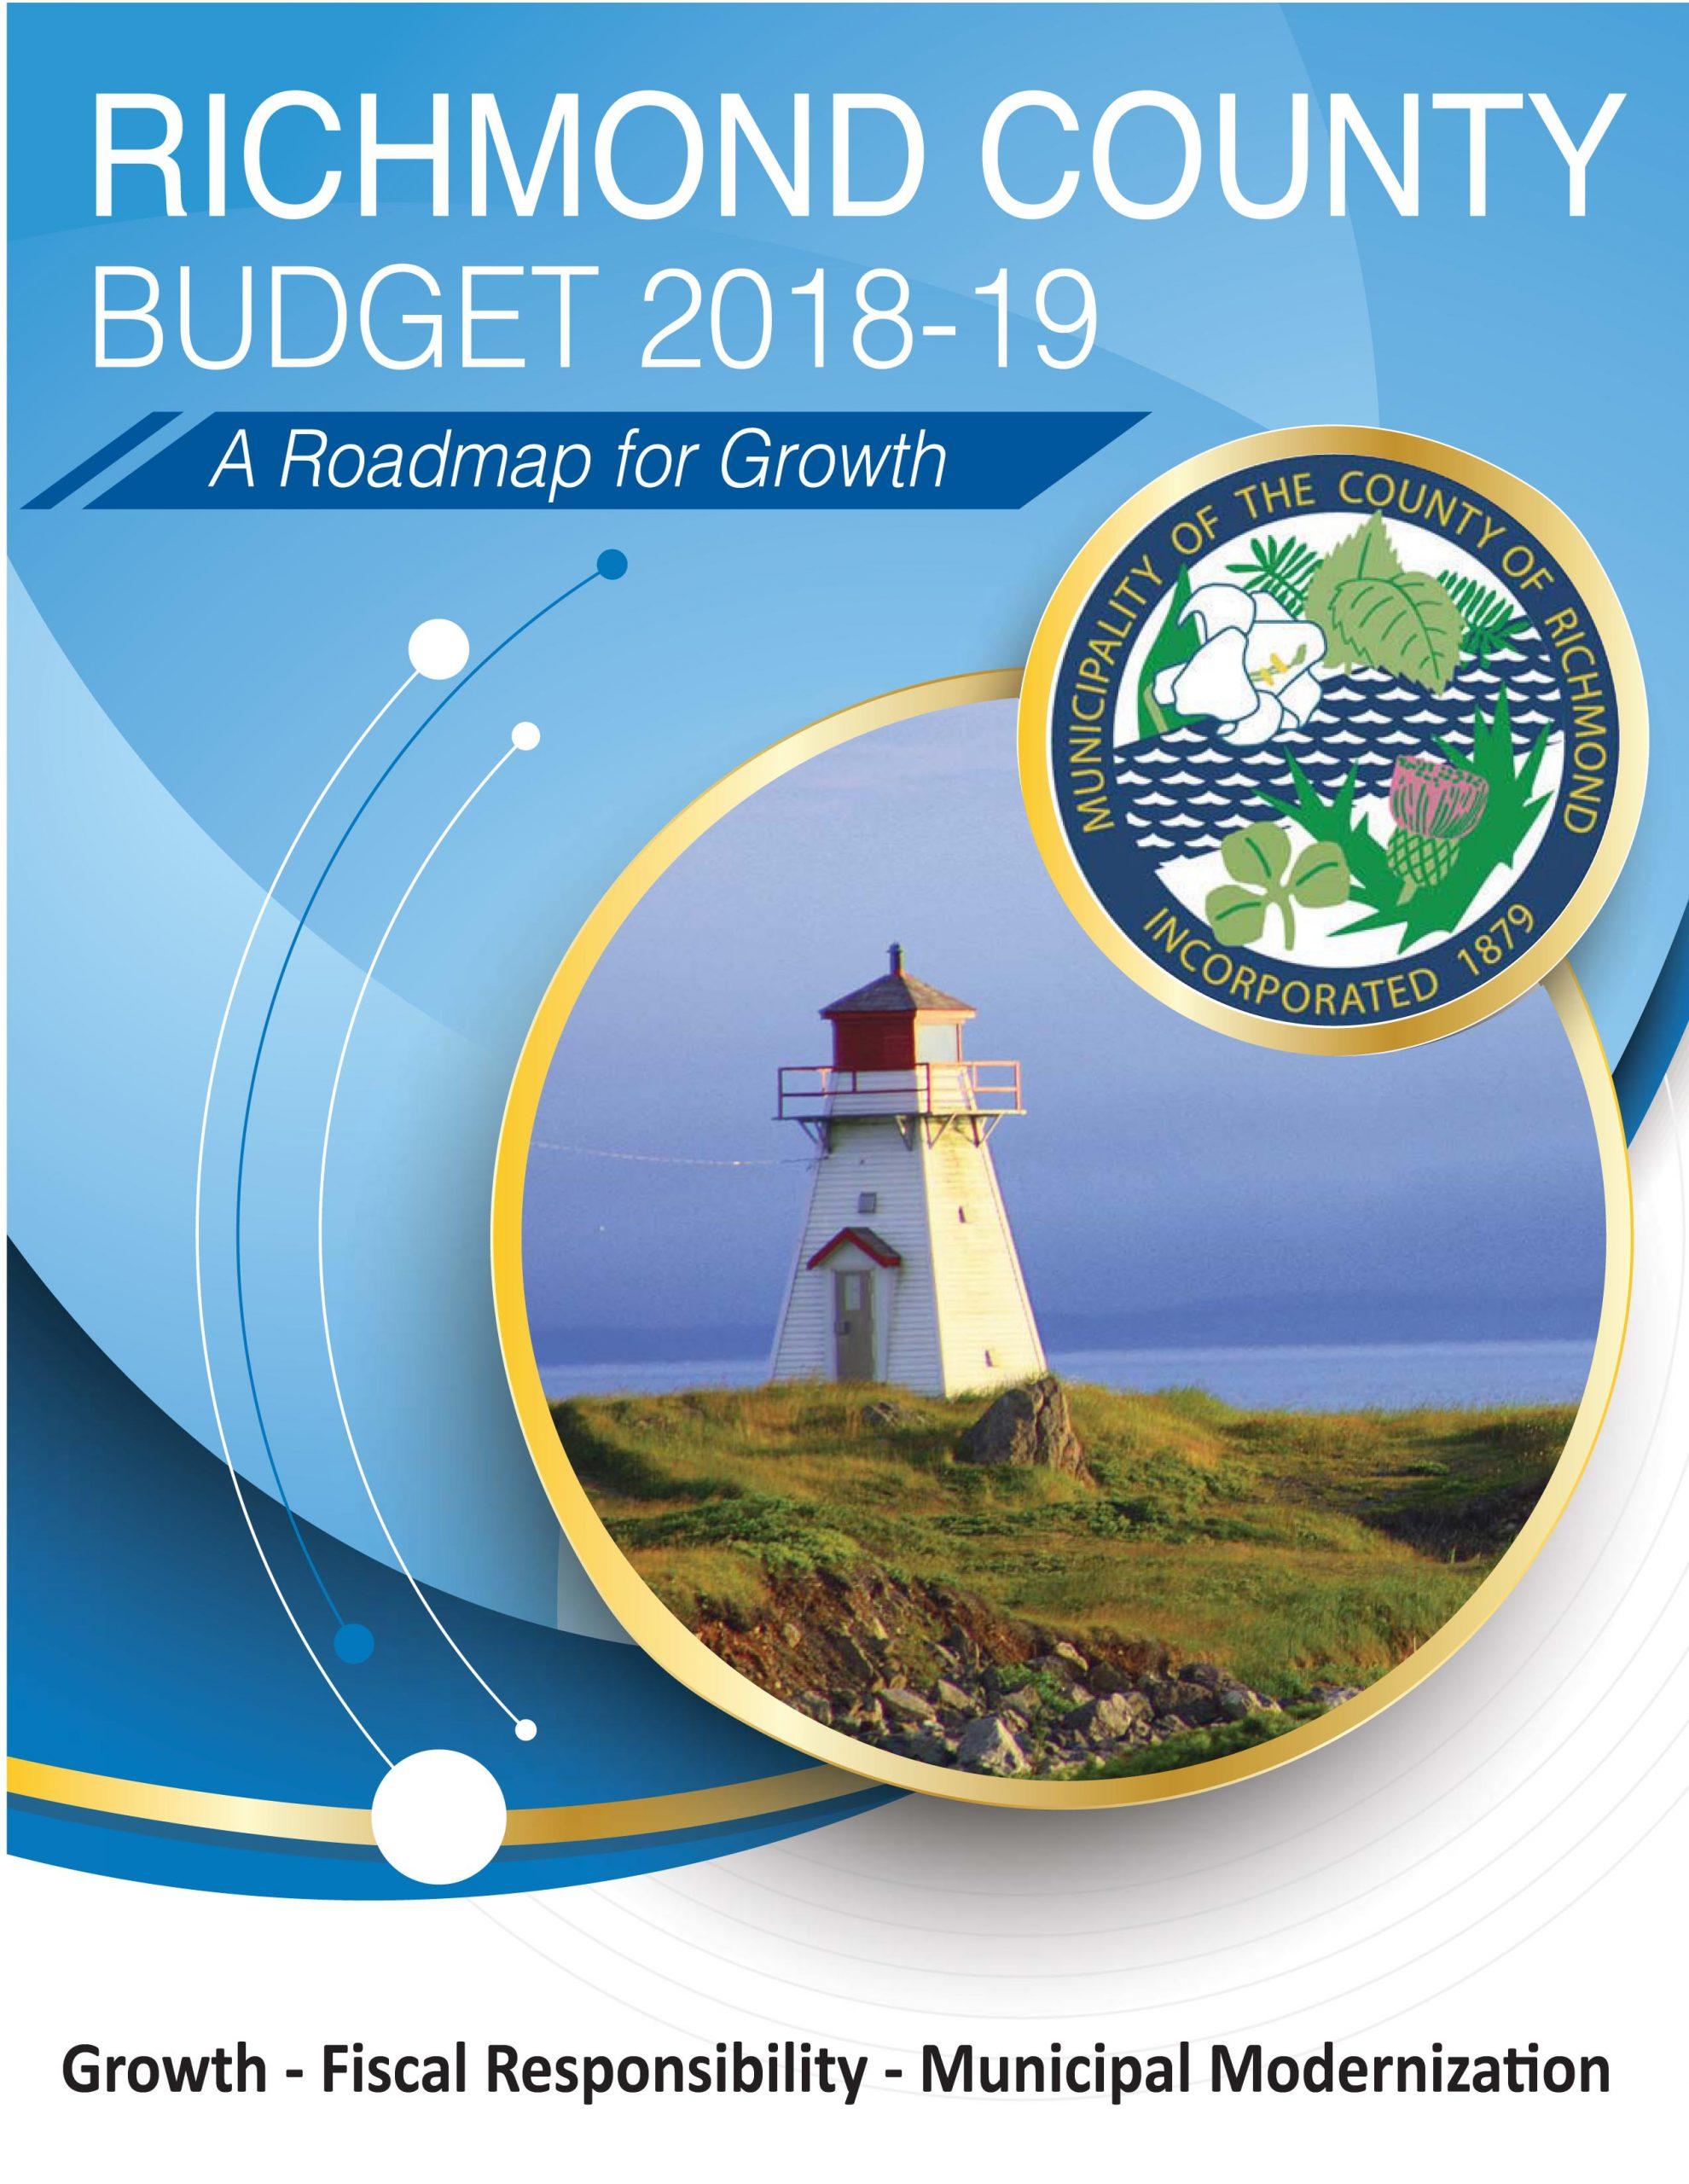 Richmond Co. councillors pass 2018-19 budget